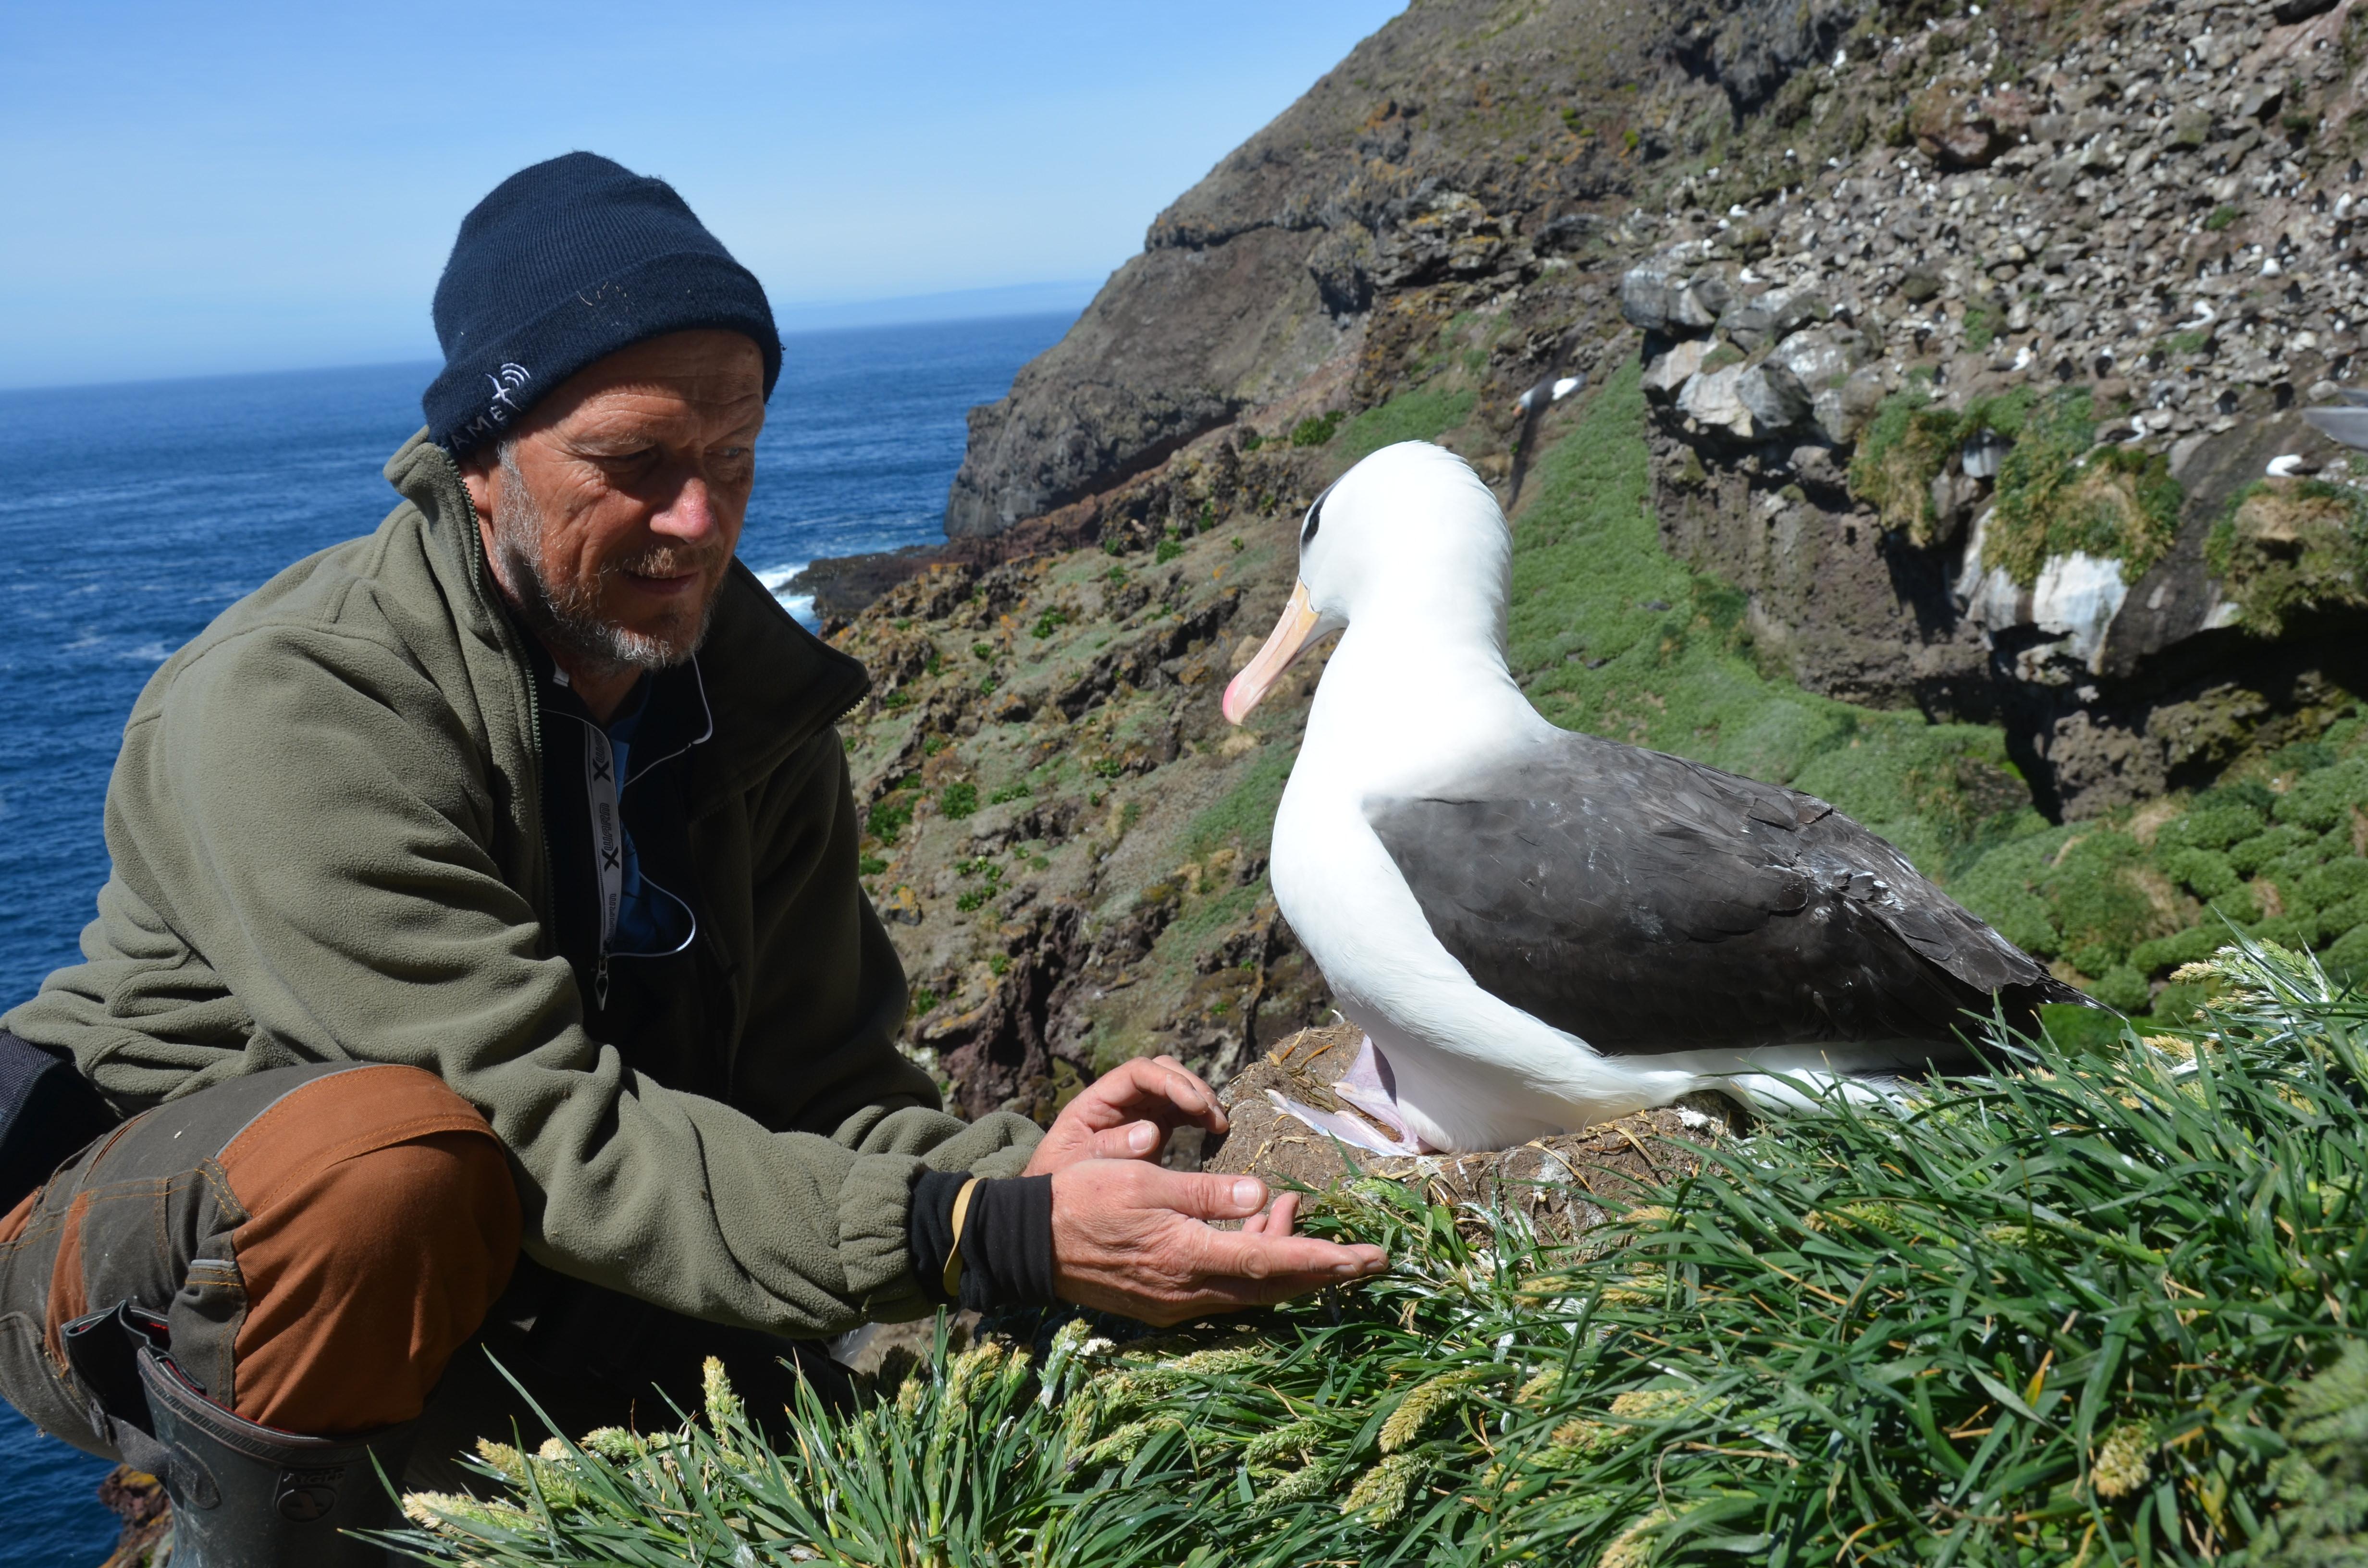 Henri Weimerskirch with a brown-browed Albatross on Kerguelen Island in the south western indian océan. Photo: Henri Weimerskirch